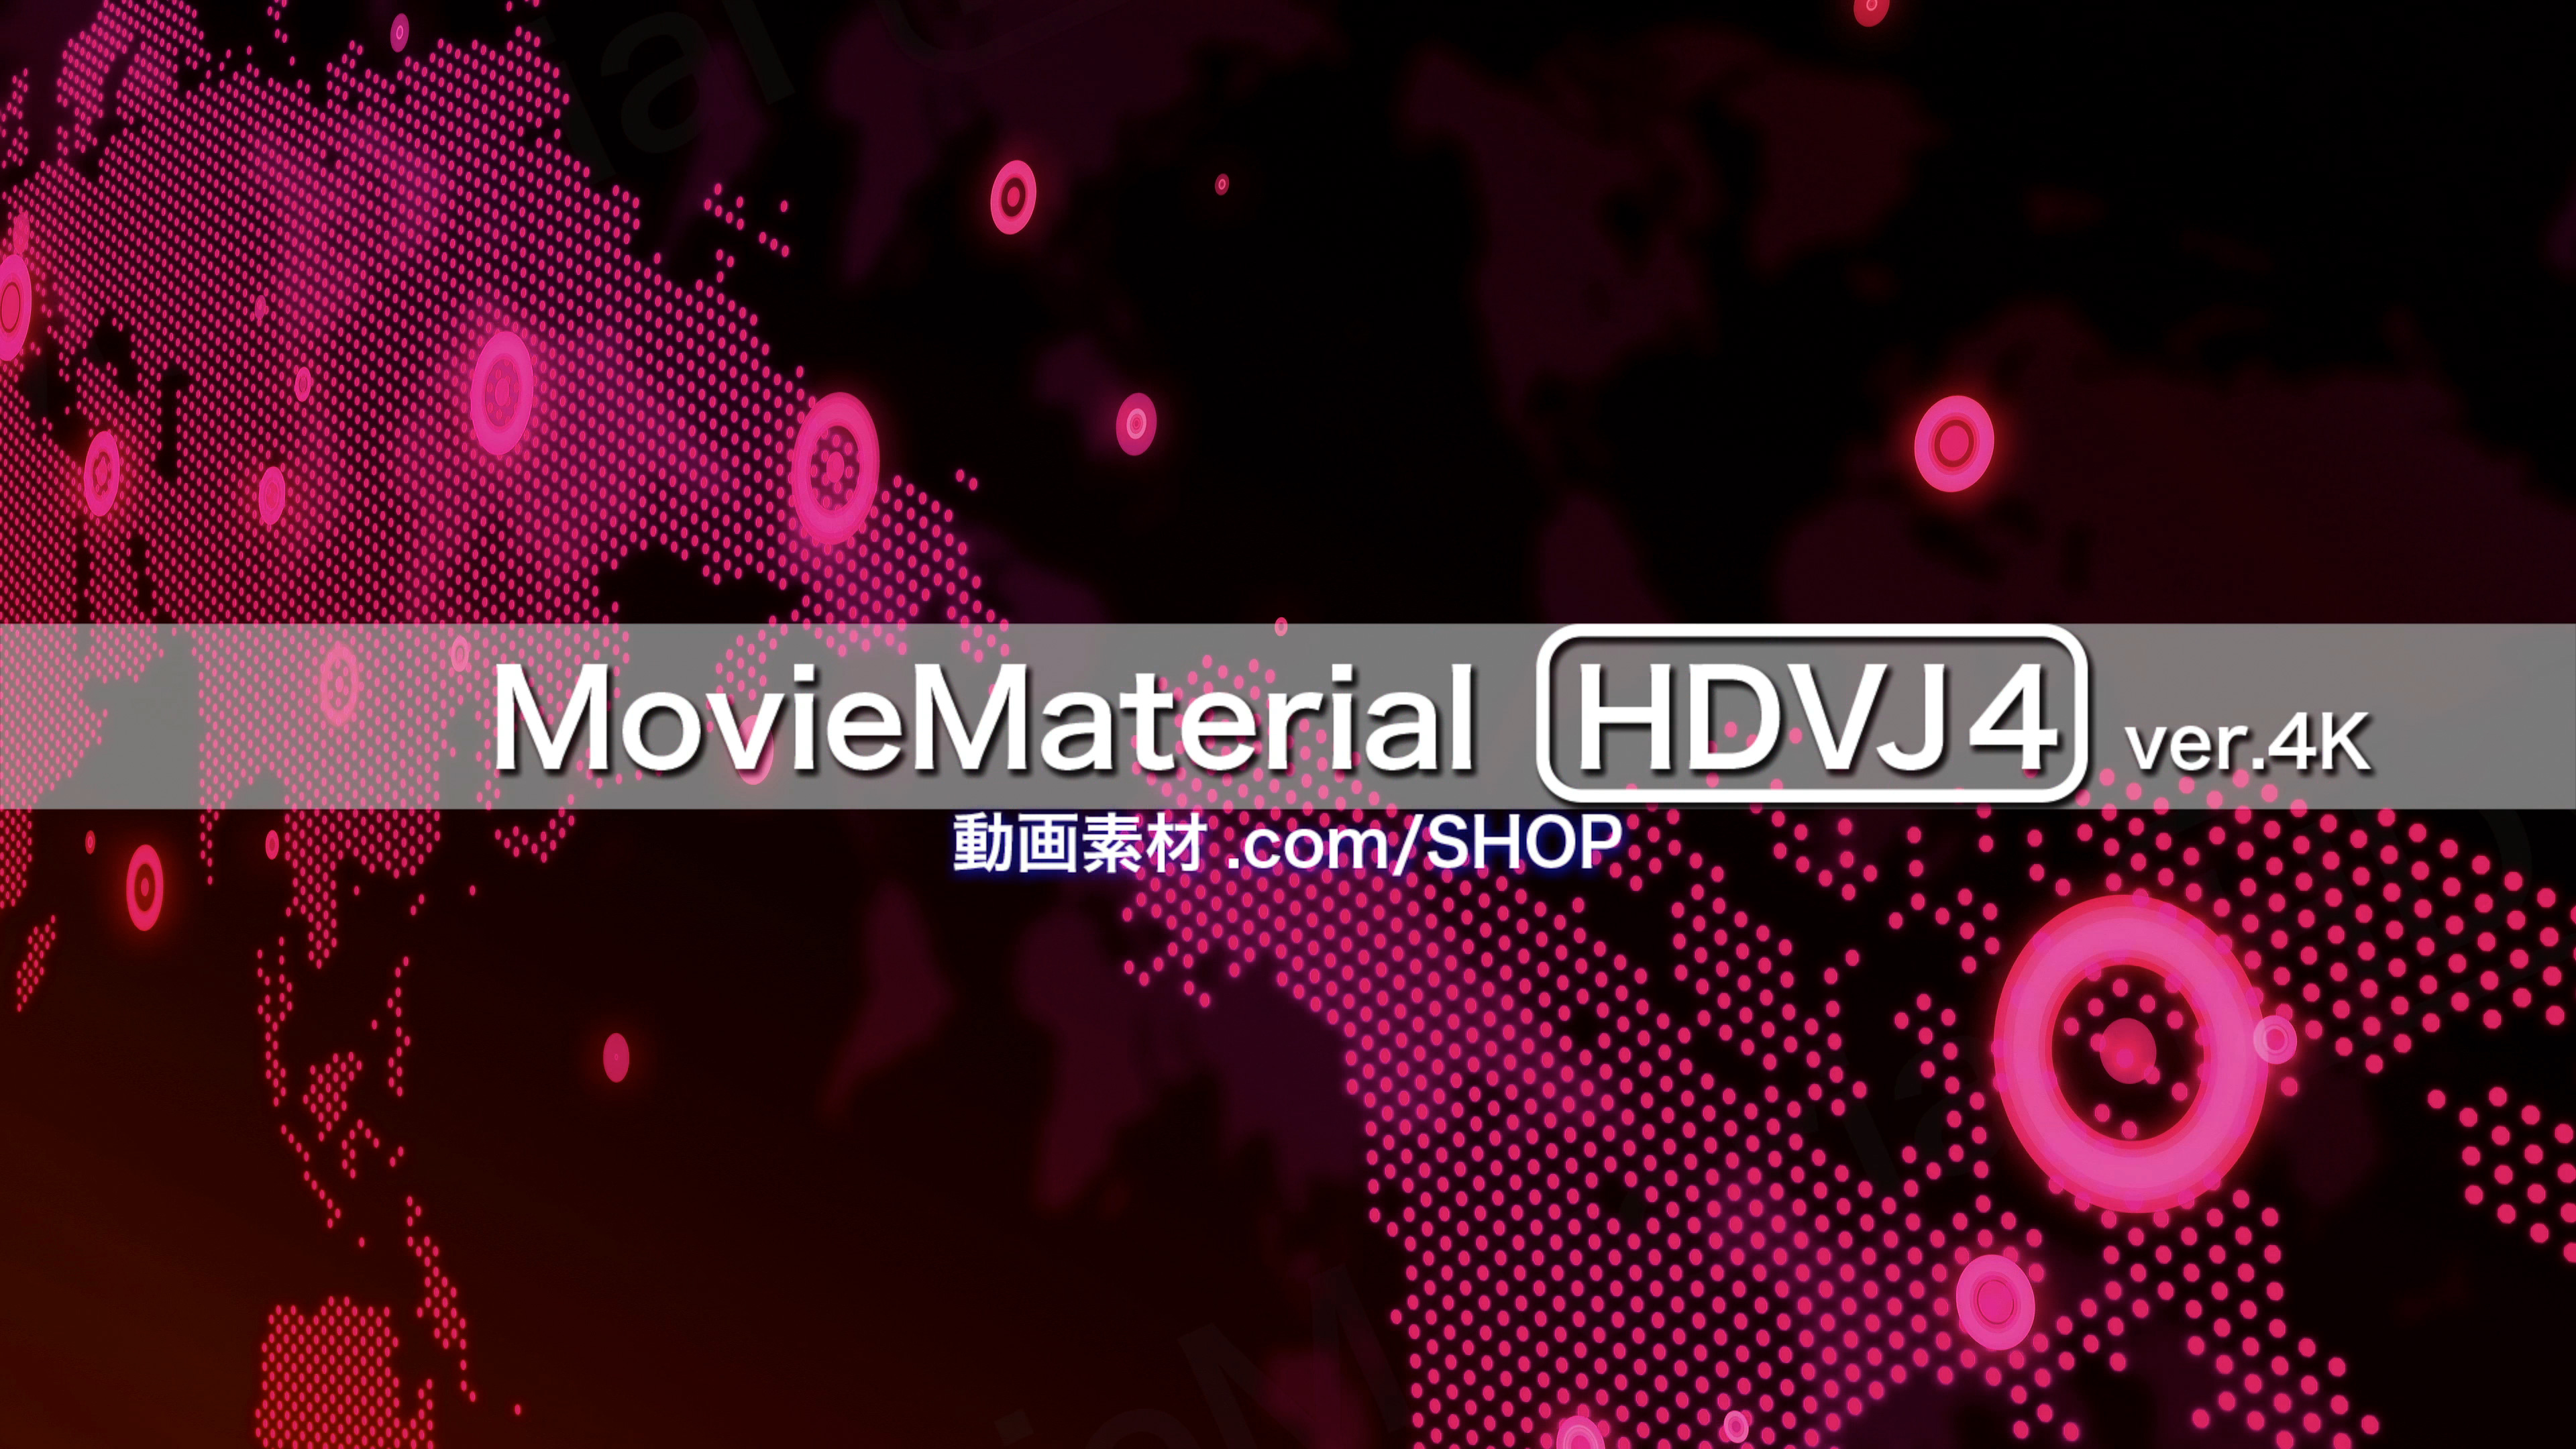 4K2Kループ動画素材集第4段【MovieMaterial HDVJ4 ver.4K】ロイヤリティフリー(著作権使用料無料)9